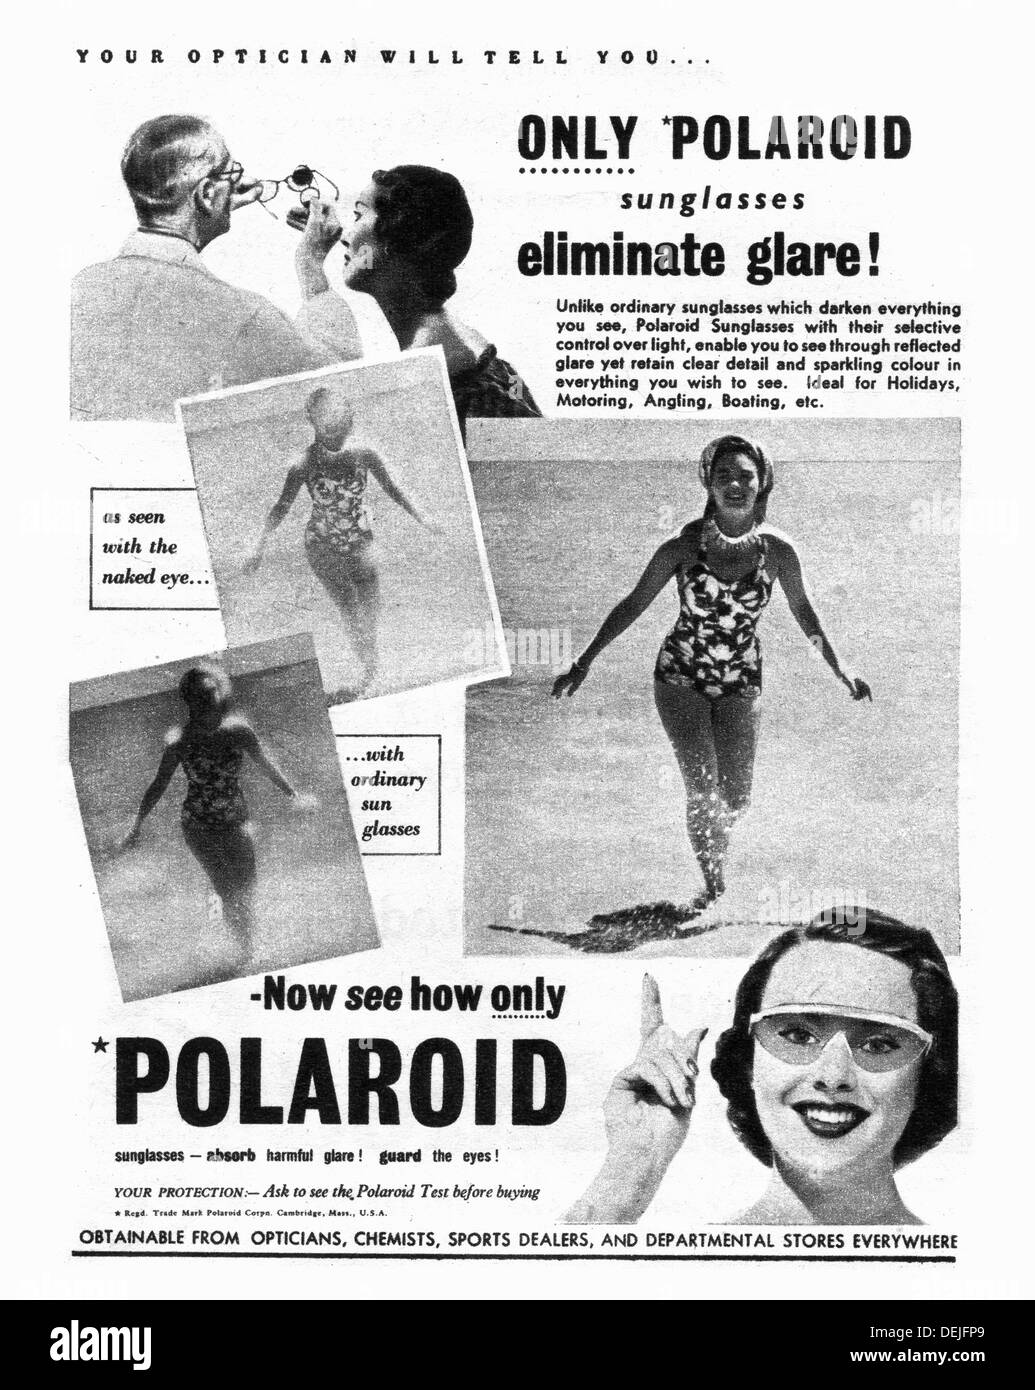 Polaroid sunglasses advert in 1953 in the UK - Stock Image